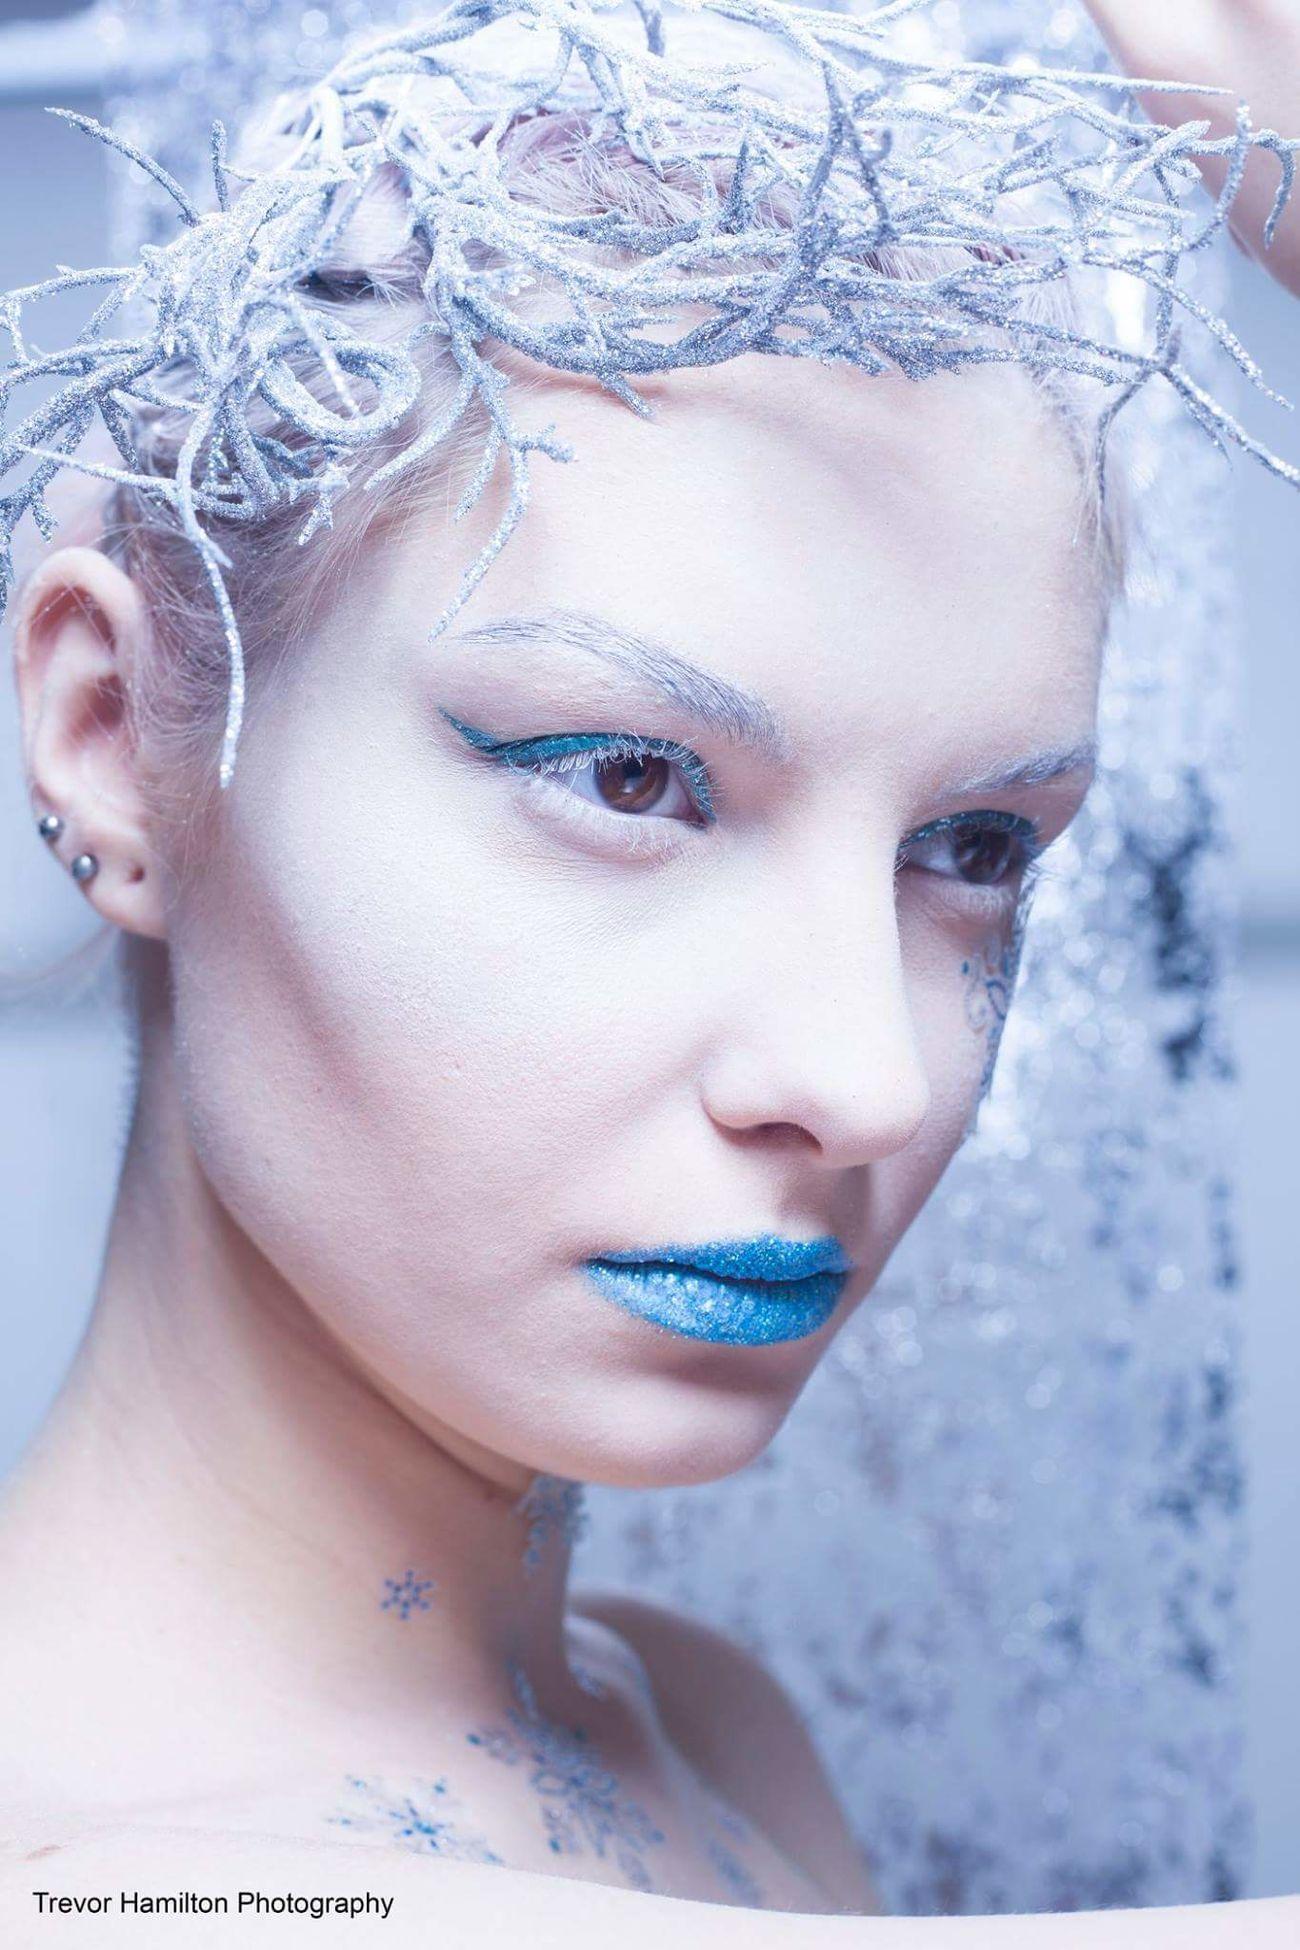 'Snow Queen' concept with Agi Sikorska. Portrait Beauty Make-up Close-up Human Face People Makeupartist Beauty EyeEm Best Shots